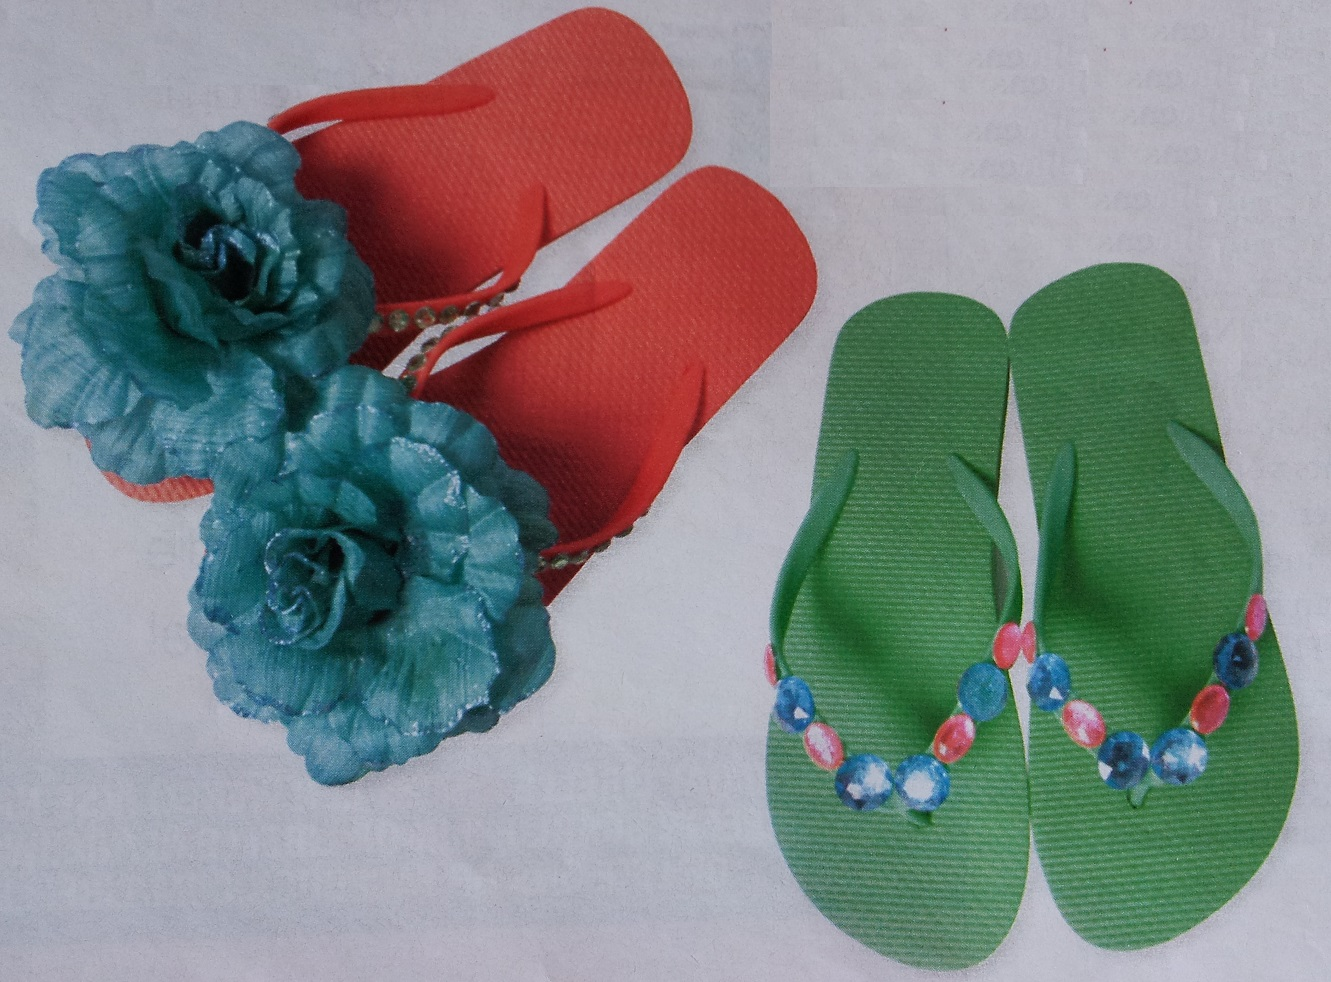 Bron: libelle.be/creatief/slippers-pimpen